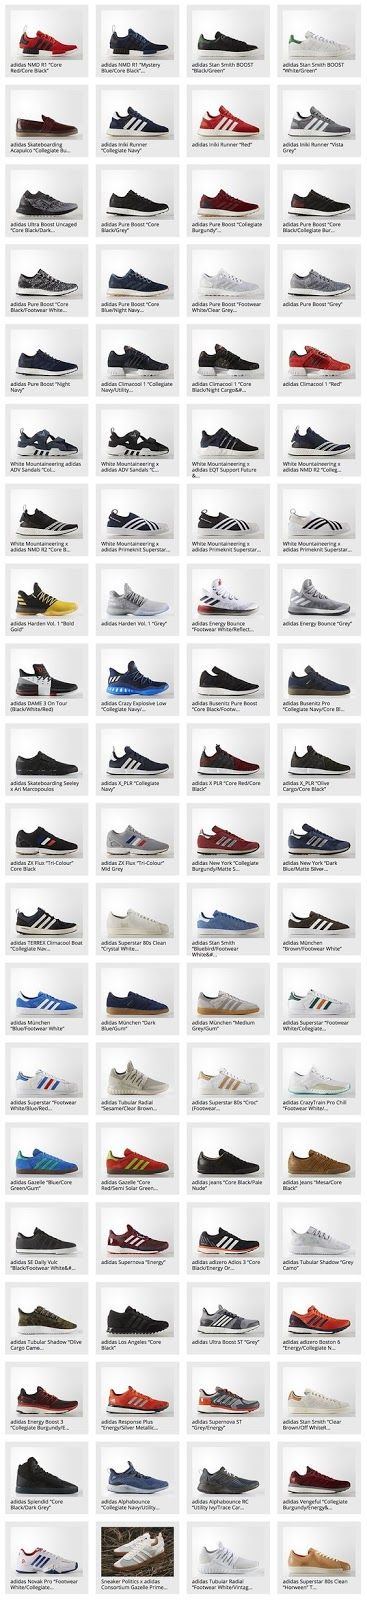 80 tipi di scarpe ADIDAS http://staypulp.blogspot.com/2017/03/80-tipi-di-scarpe-adidas.html